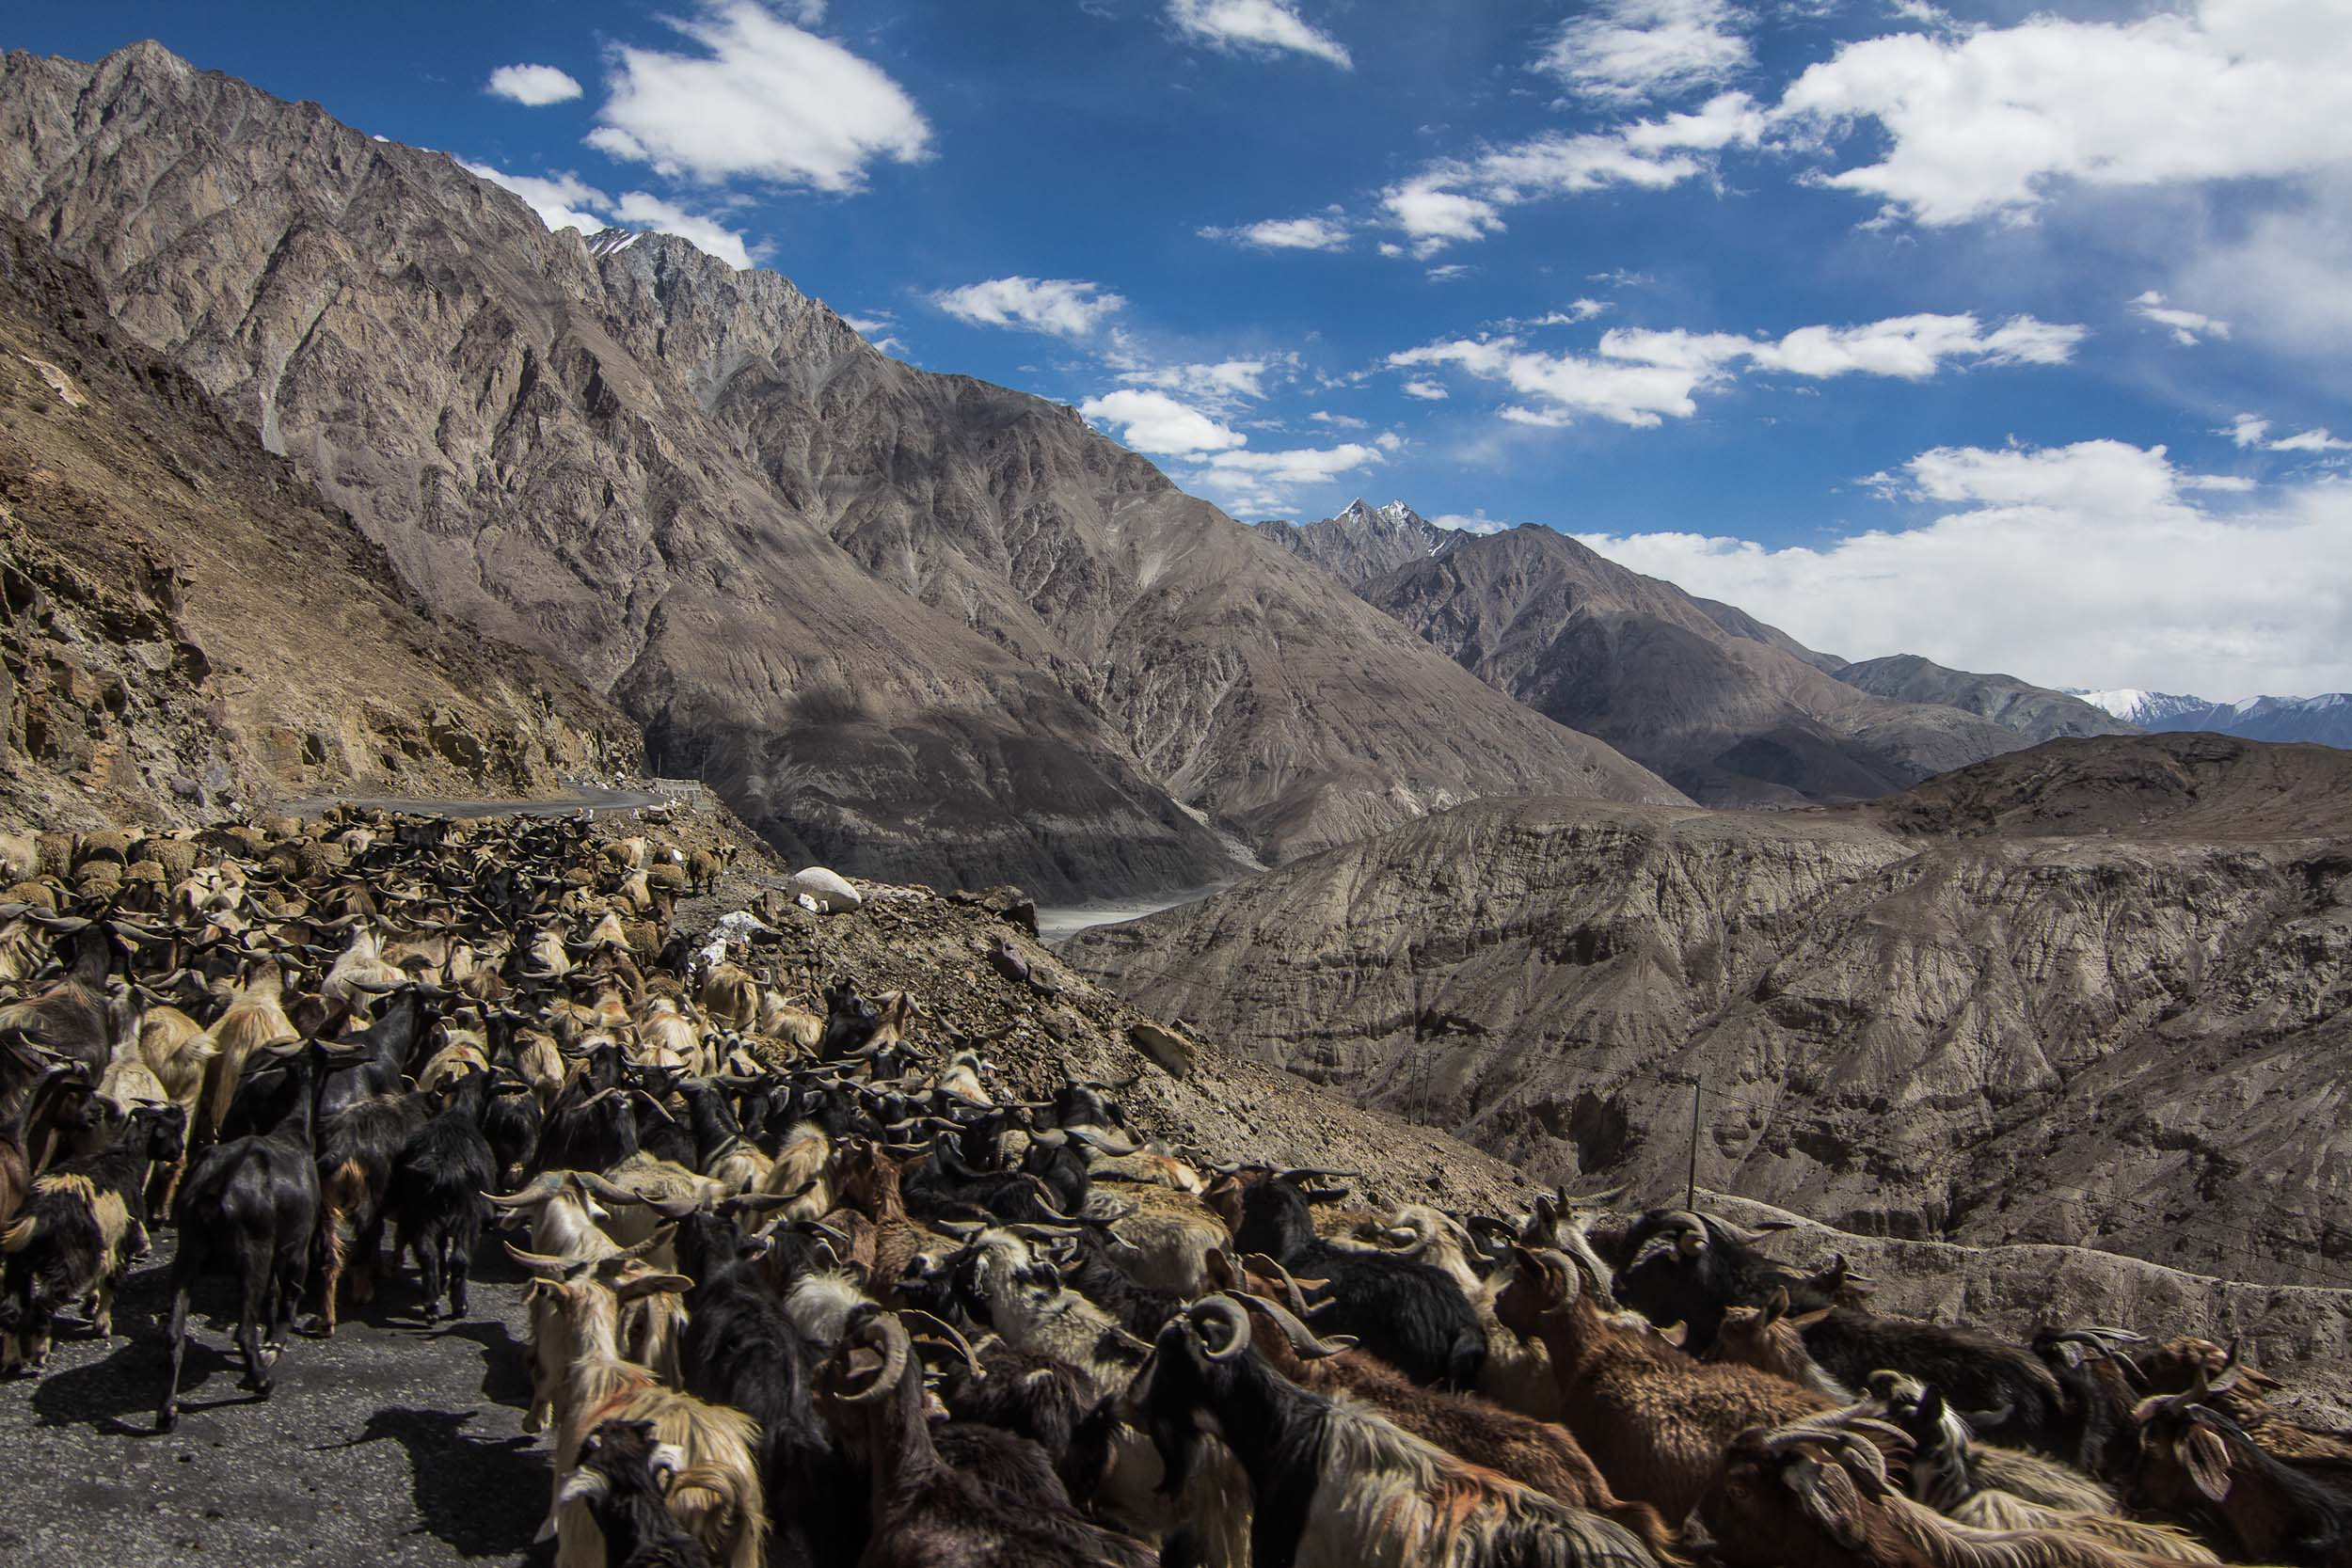 Sindhur_Photography_Travel_Landscape_Ladakh-10.JPG